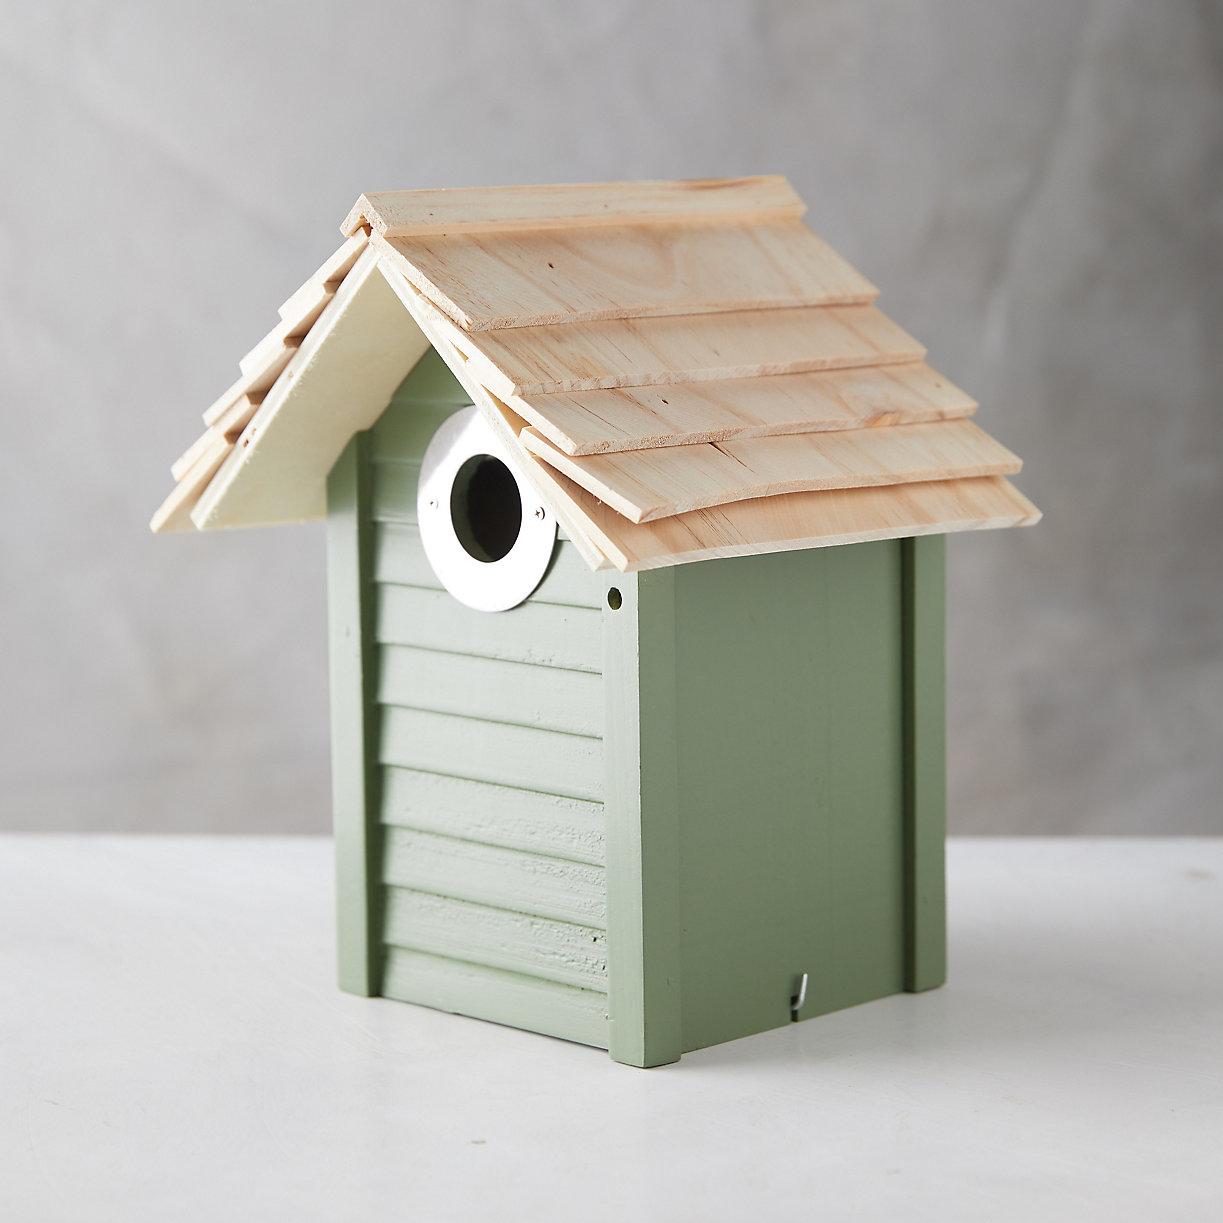 Terrain New England Birdhouse